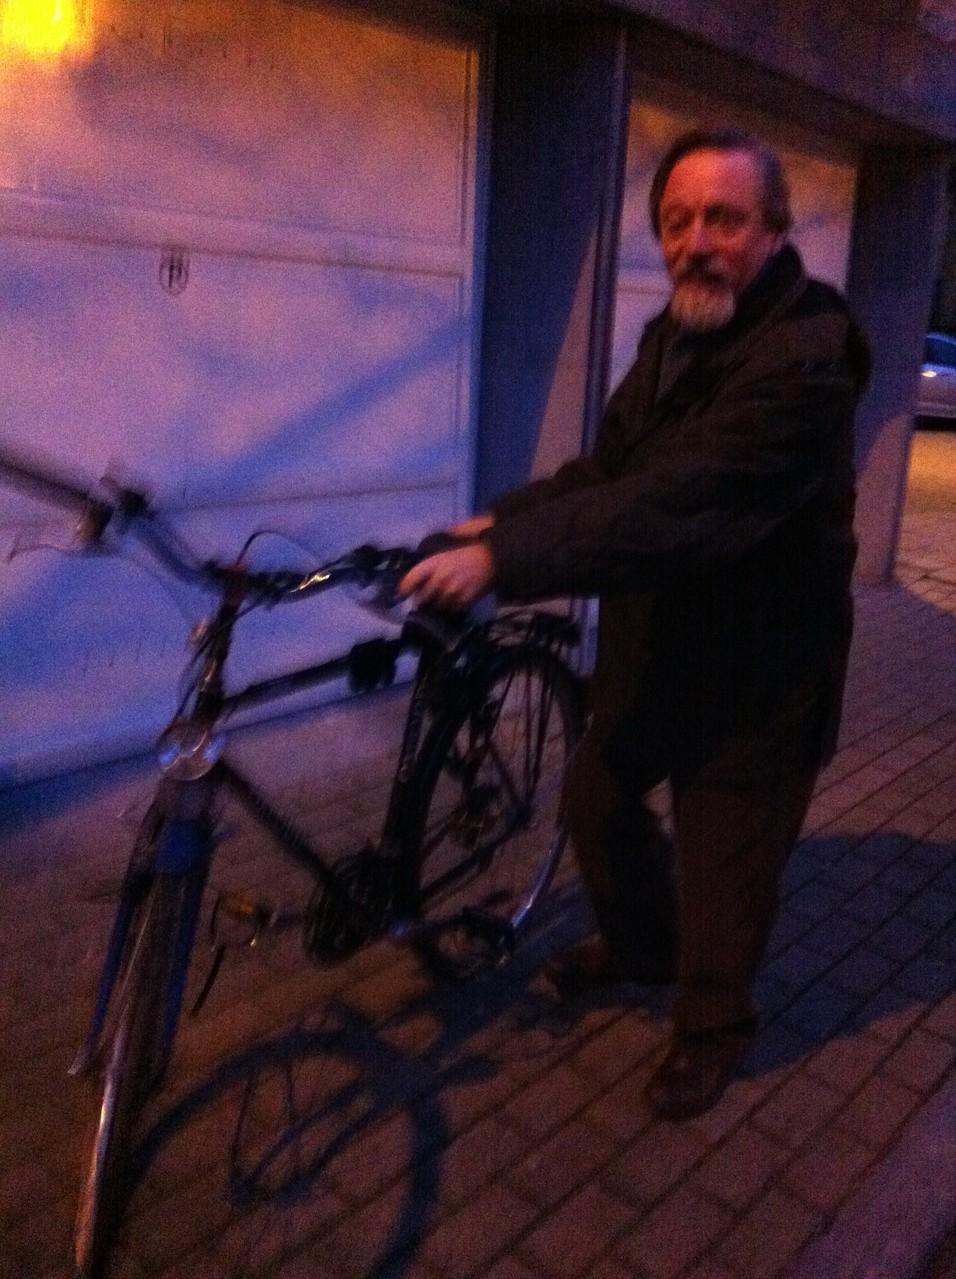 Schroyen博士の自転車姿